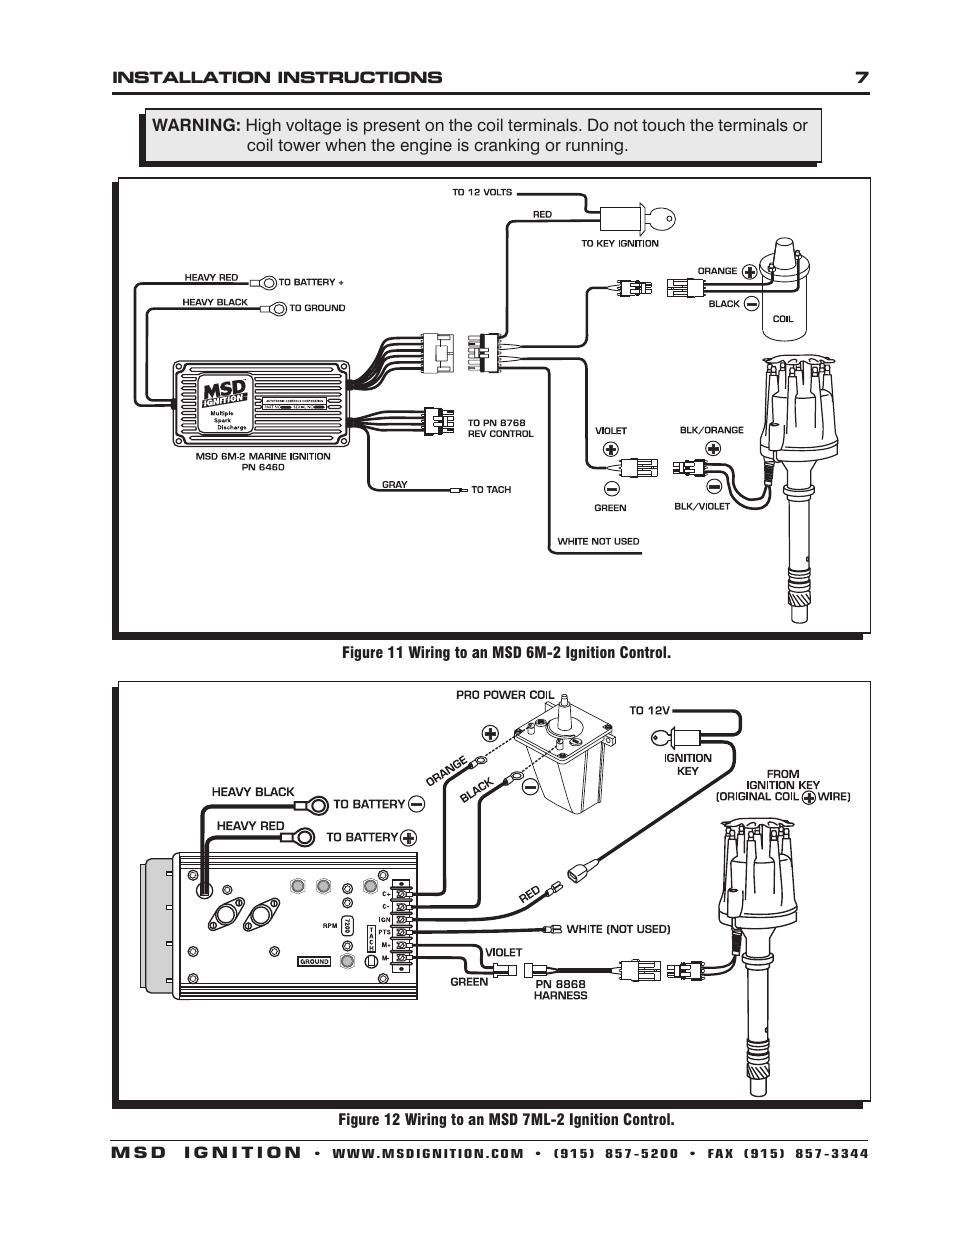 Bodine B90 Wiring Diagram Trailblazer 4.2 Engine Parts Diagram ...